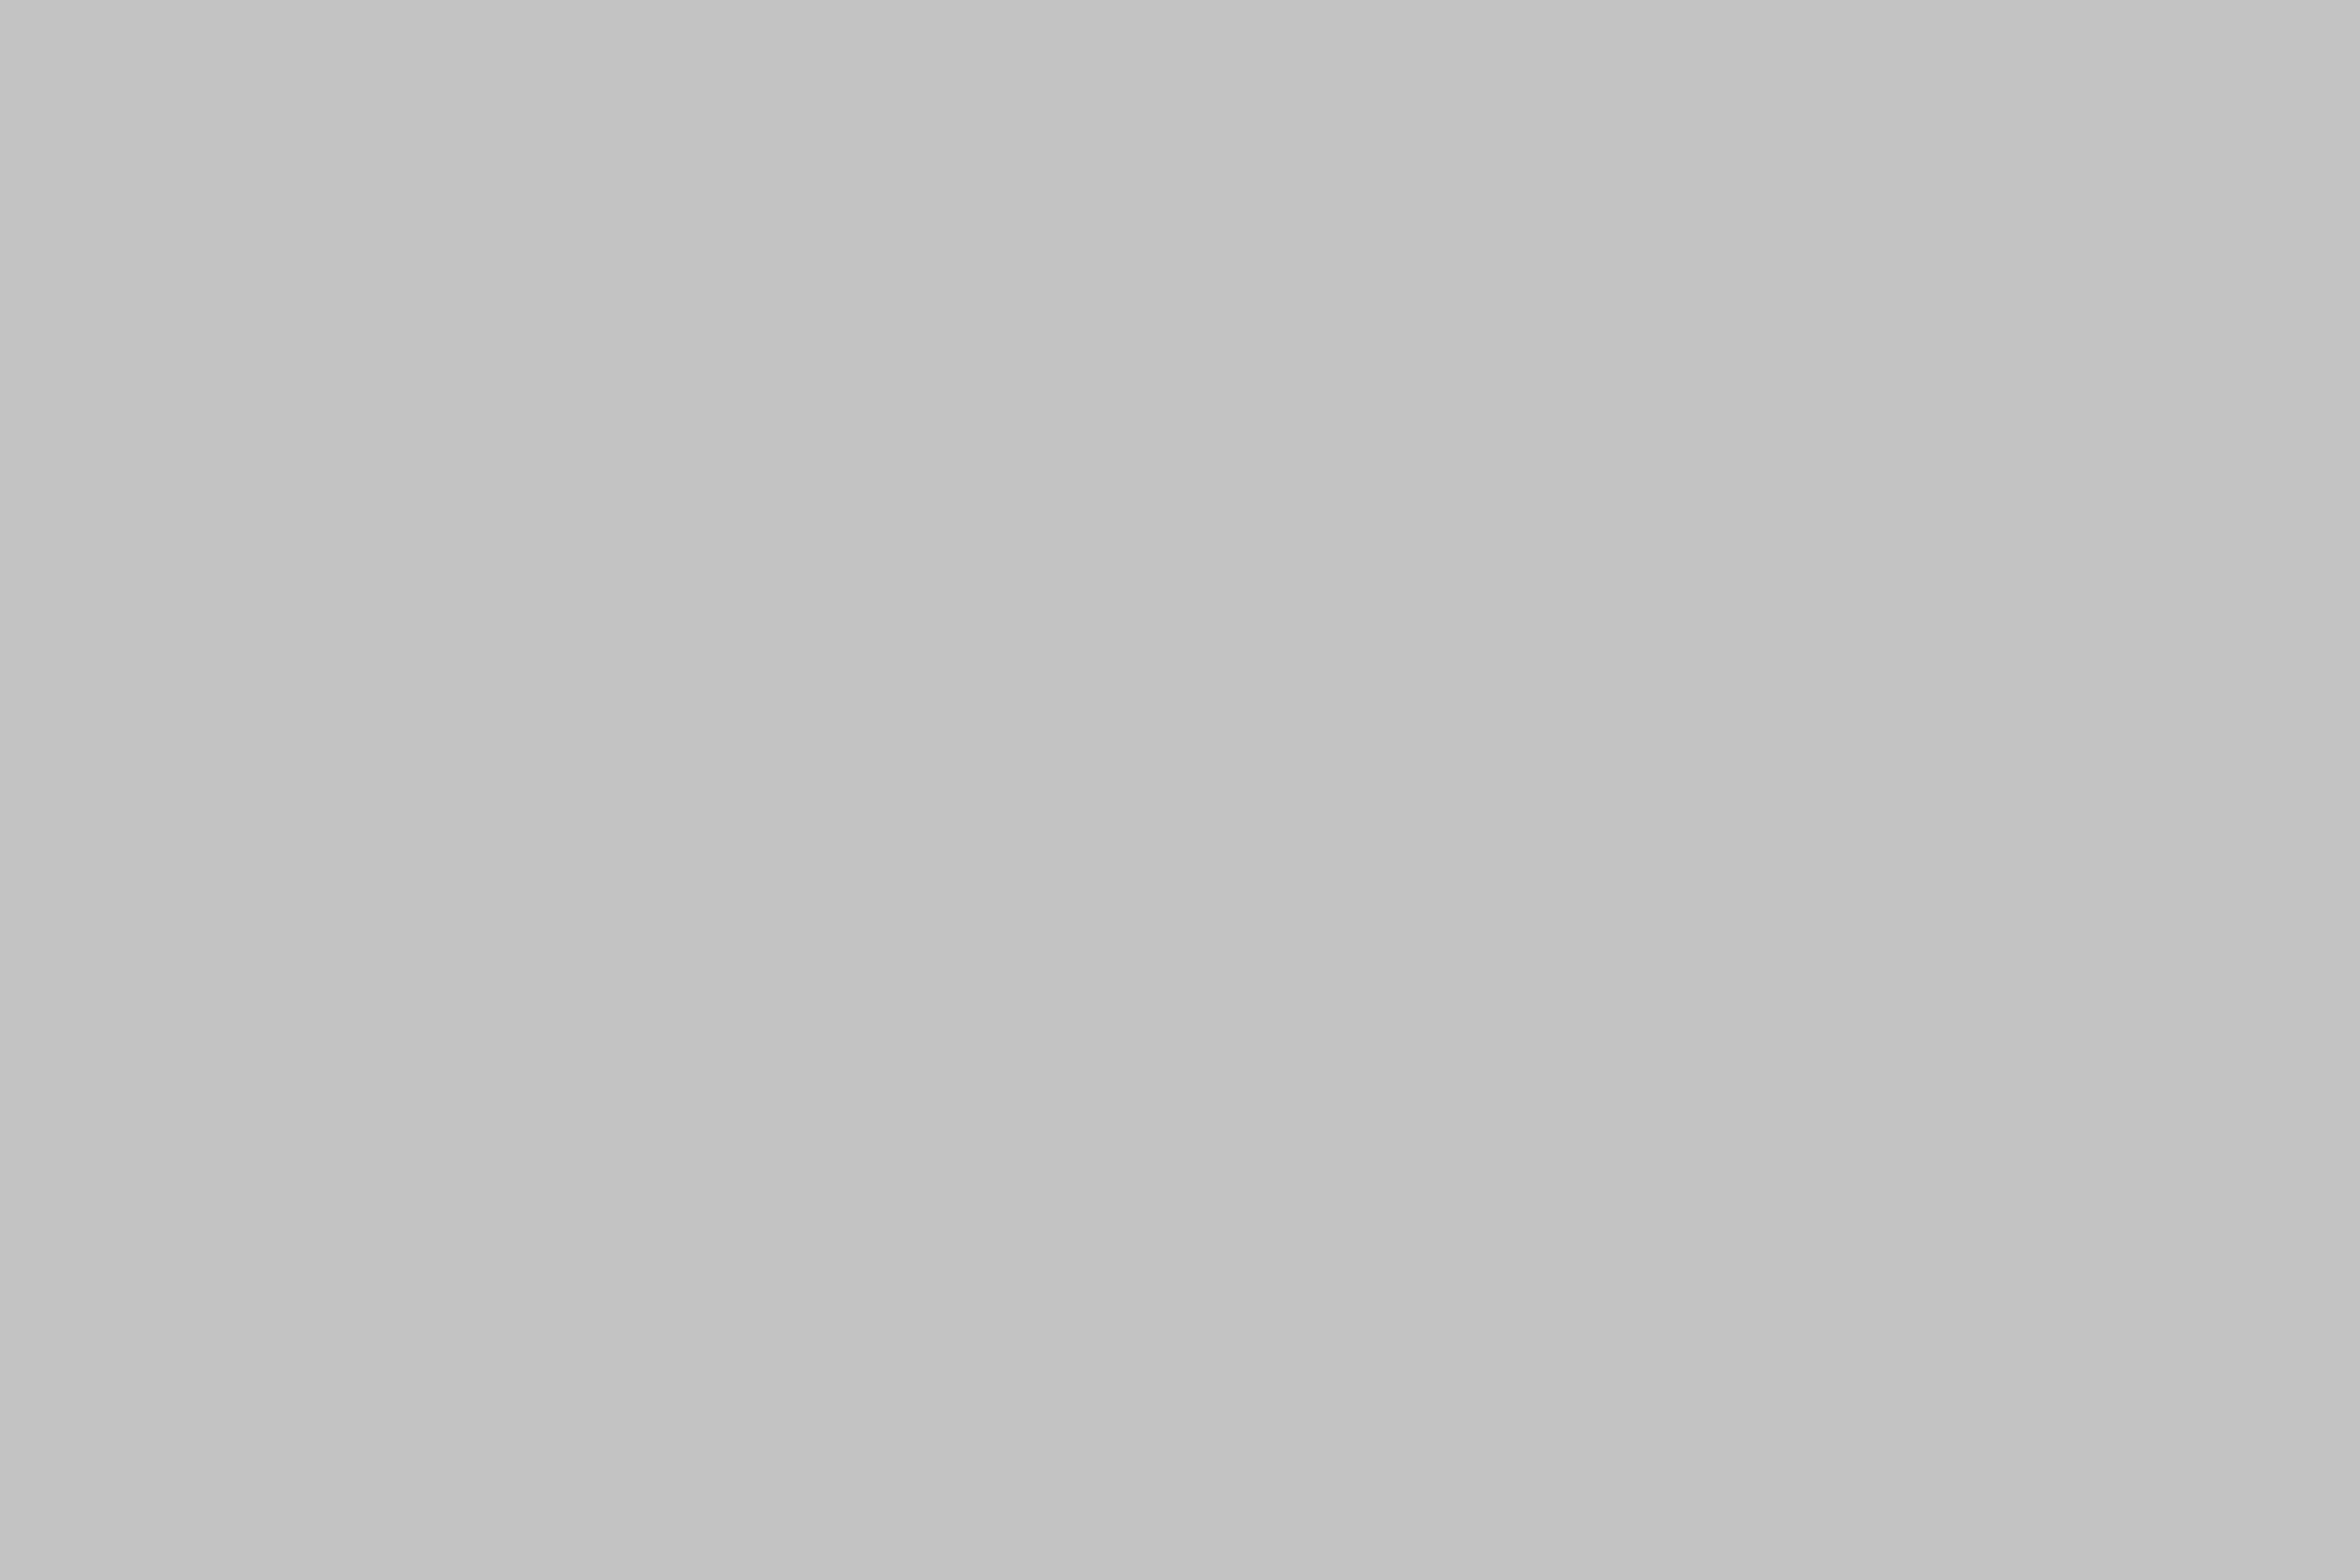 SquareSpace-SermonSeries copy 4.jpg